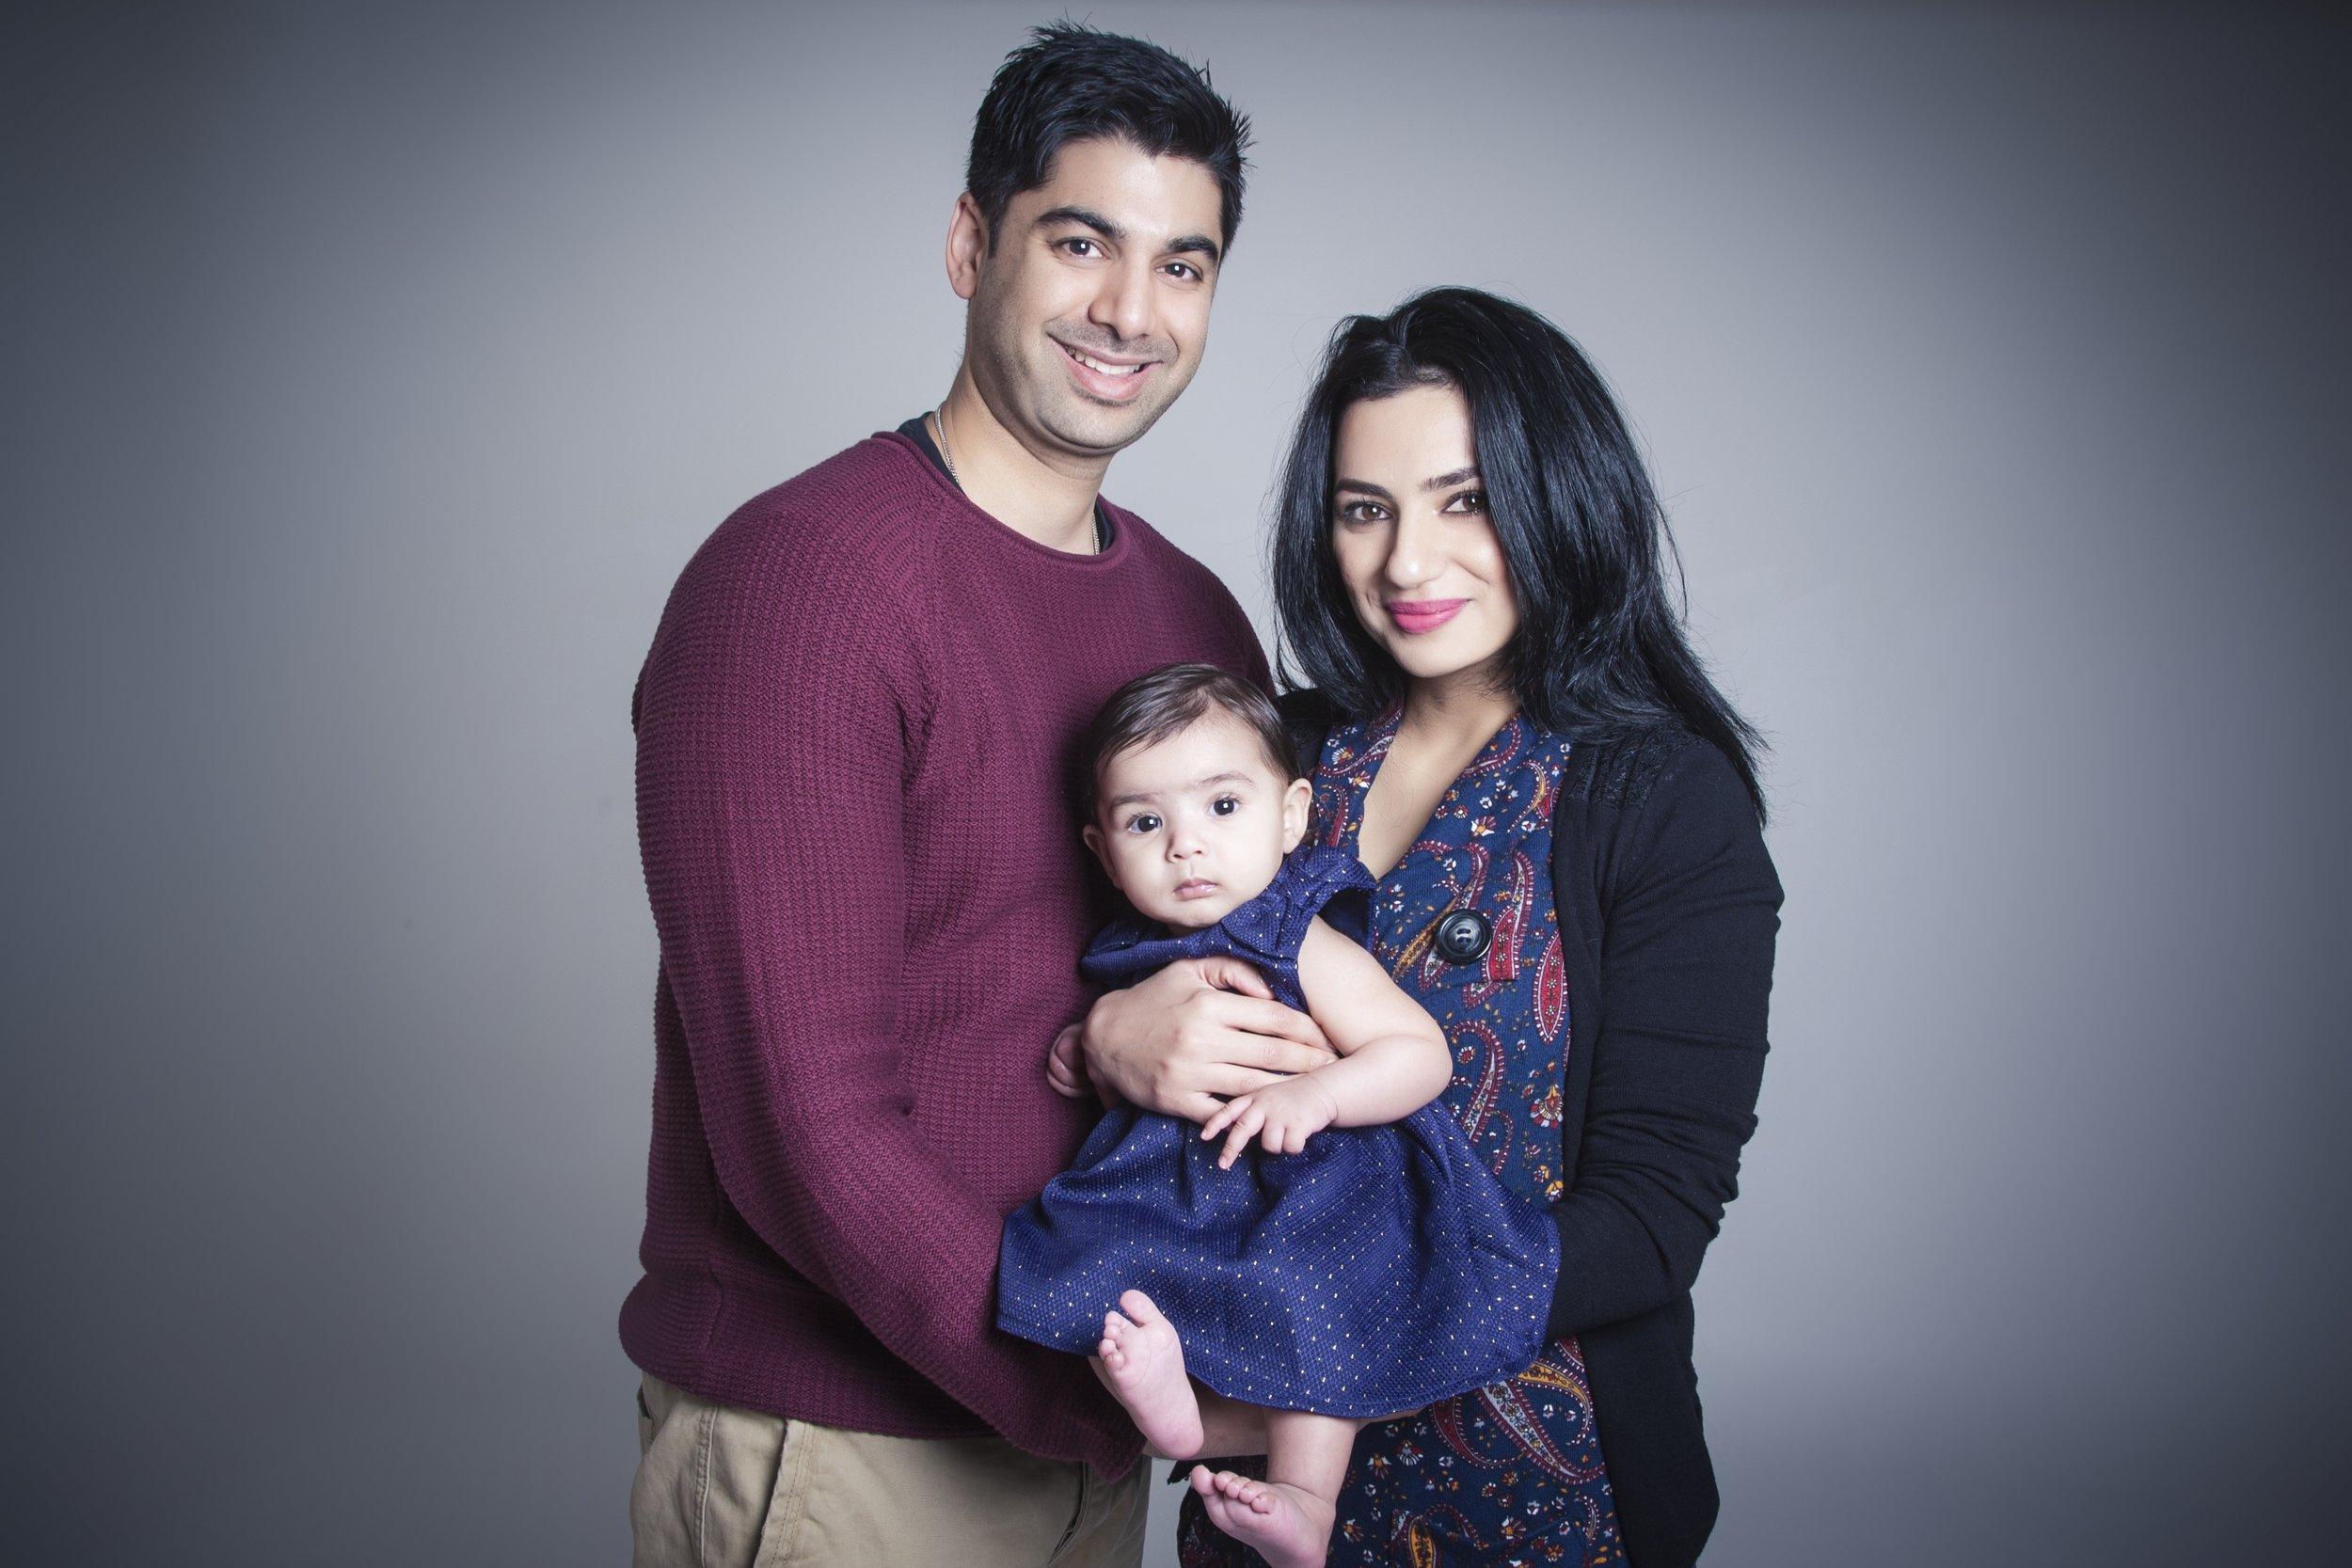 family-photography-leicester-photo-shoot-portrait-photographers-baby-family-zigzag-zig-zag.JPG